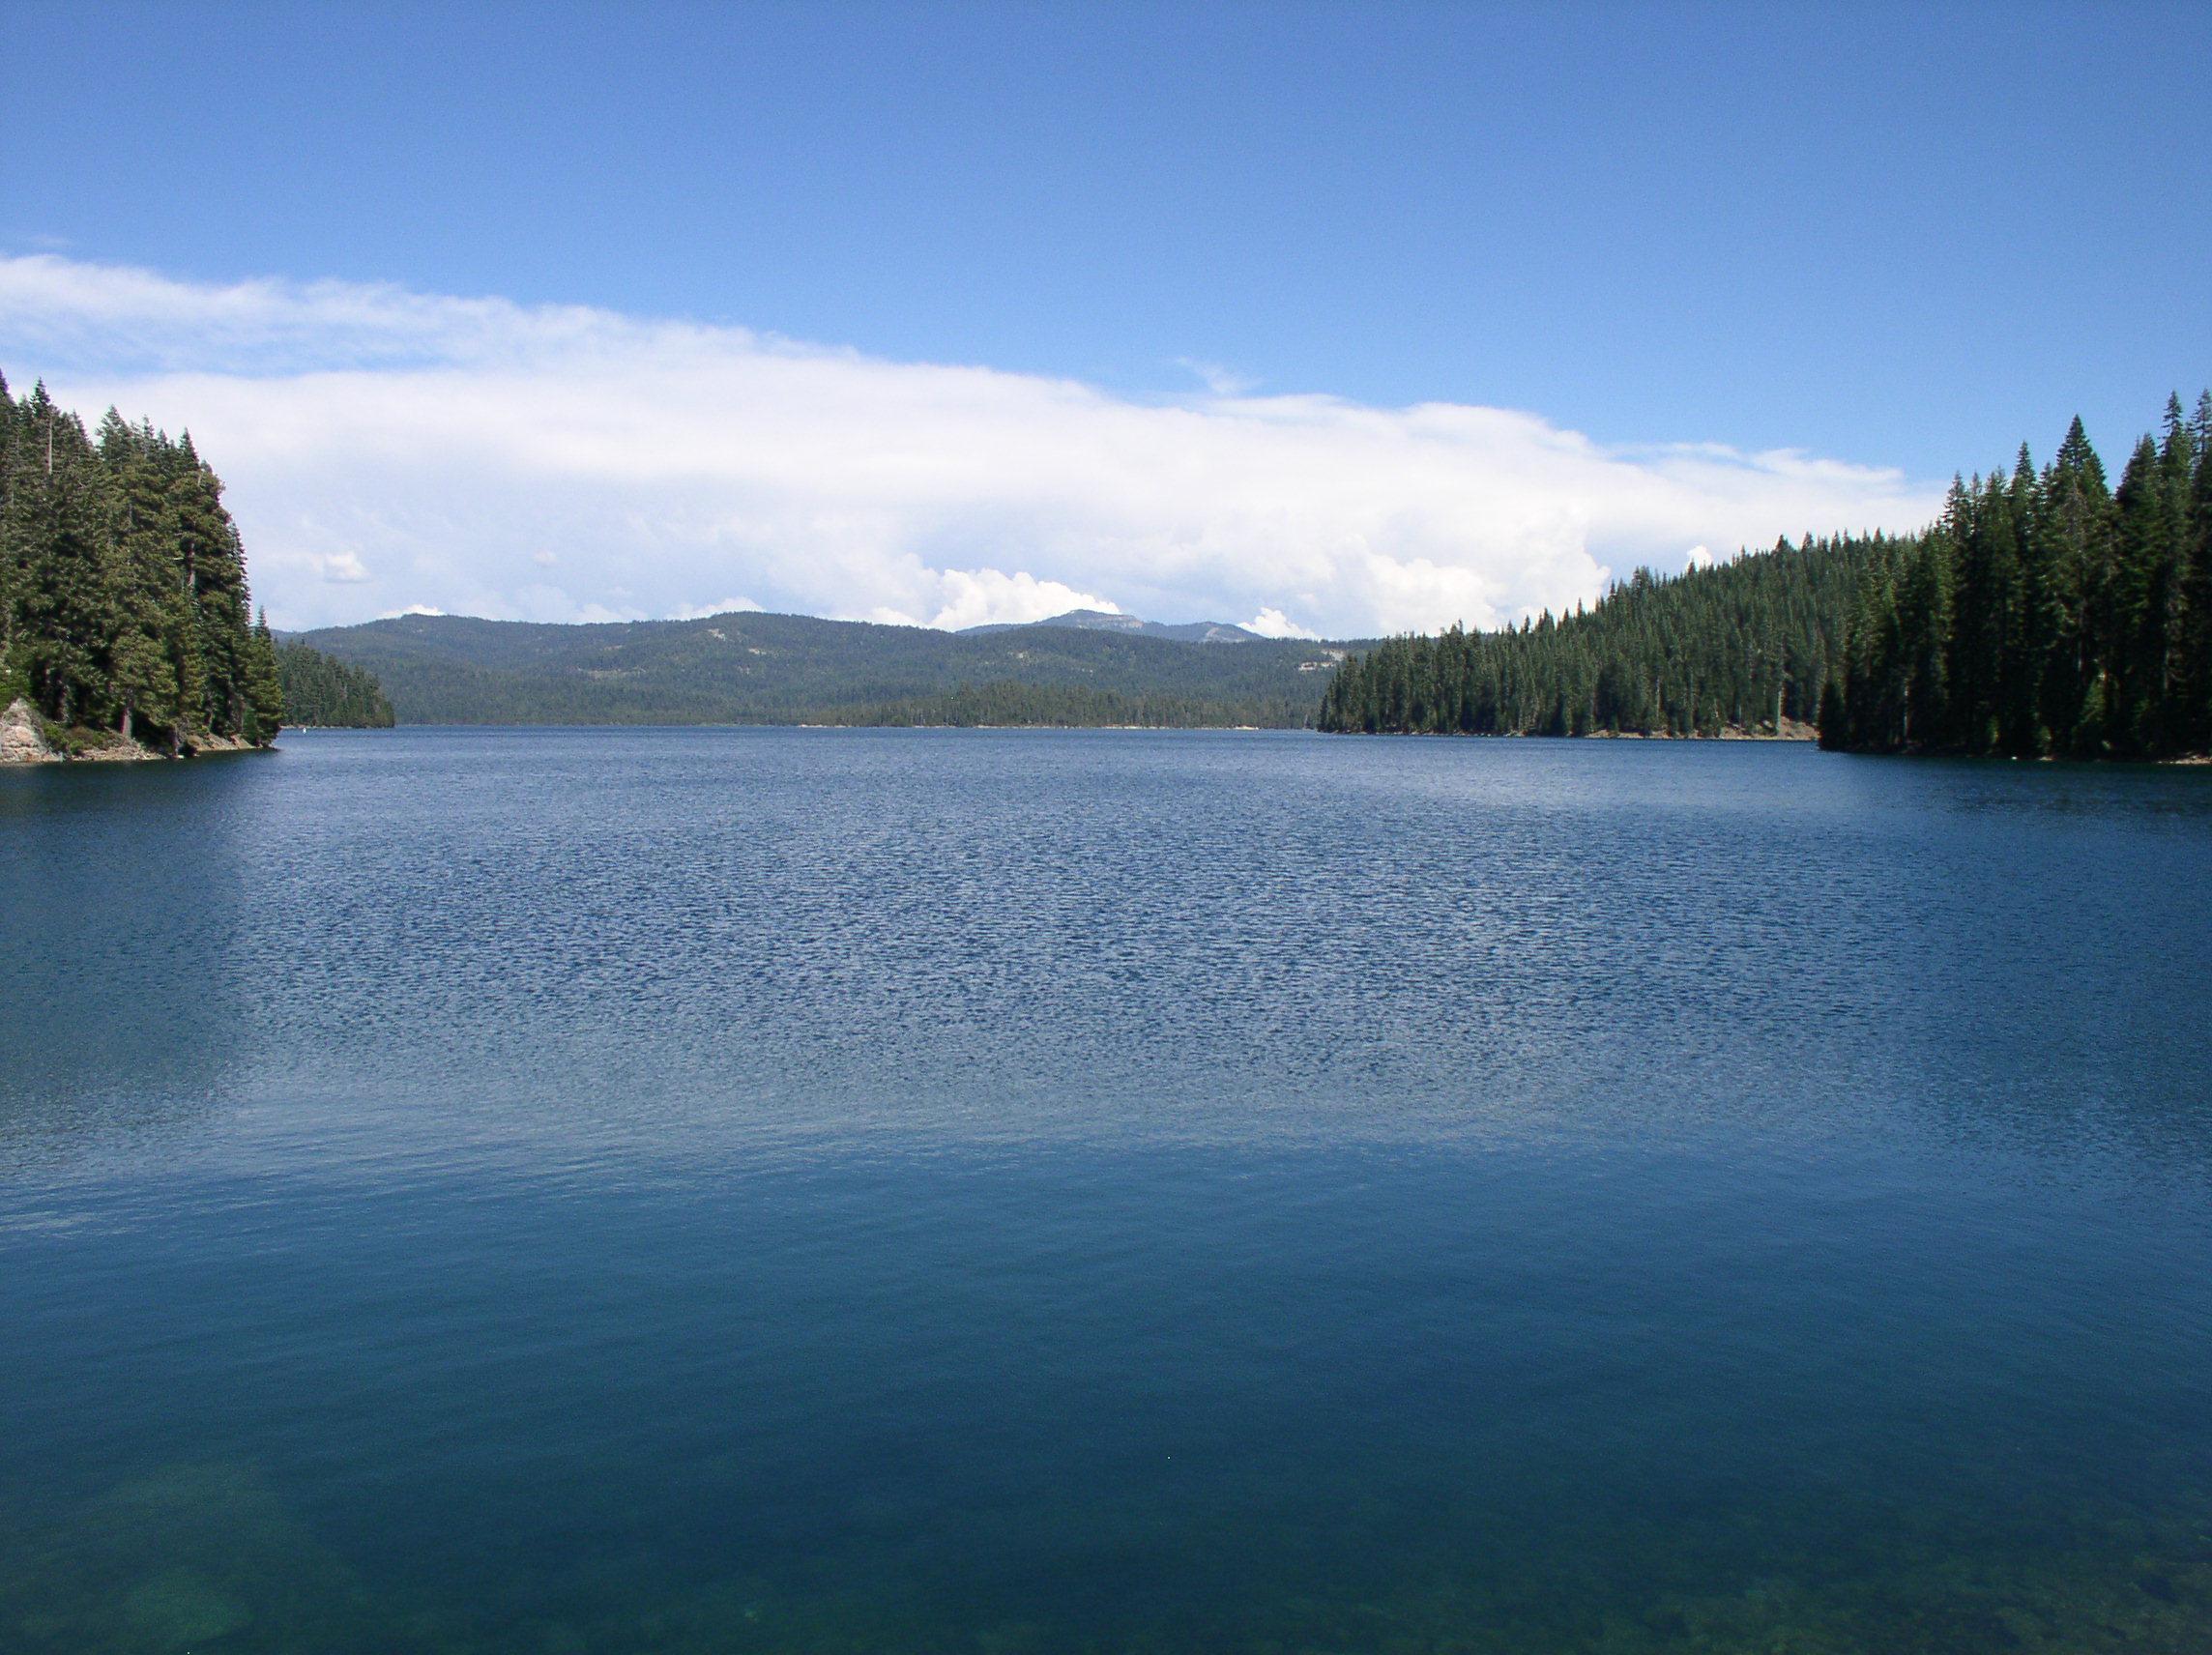 Plumas National Forest - Little Grass Valley Recreation Area